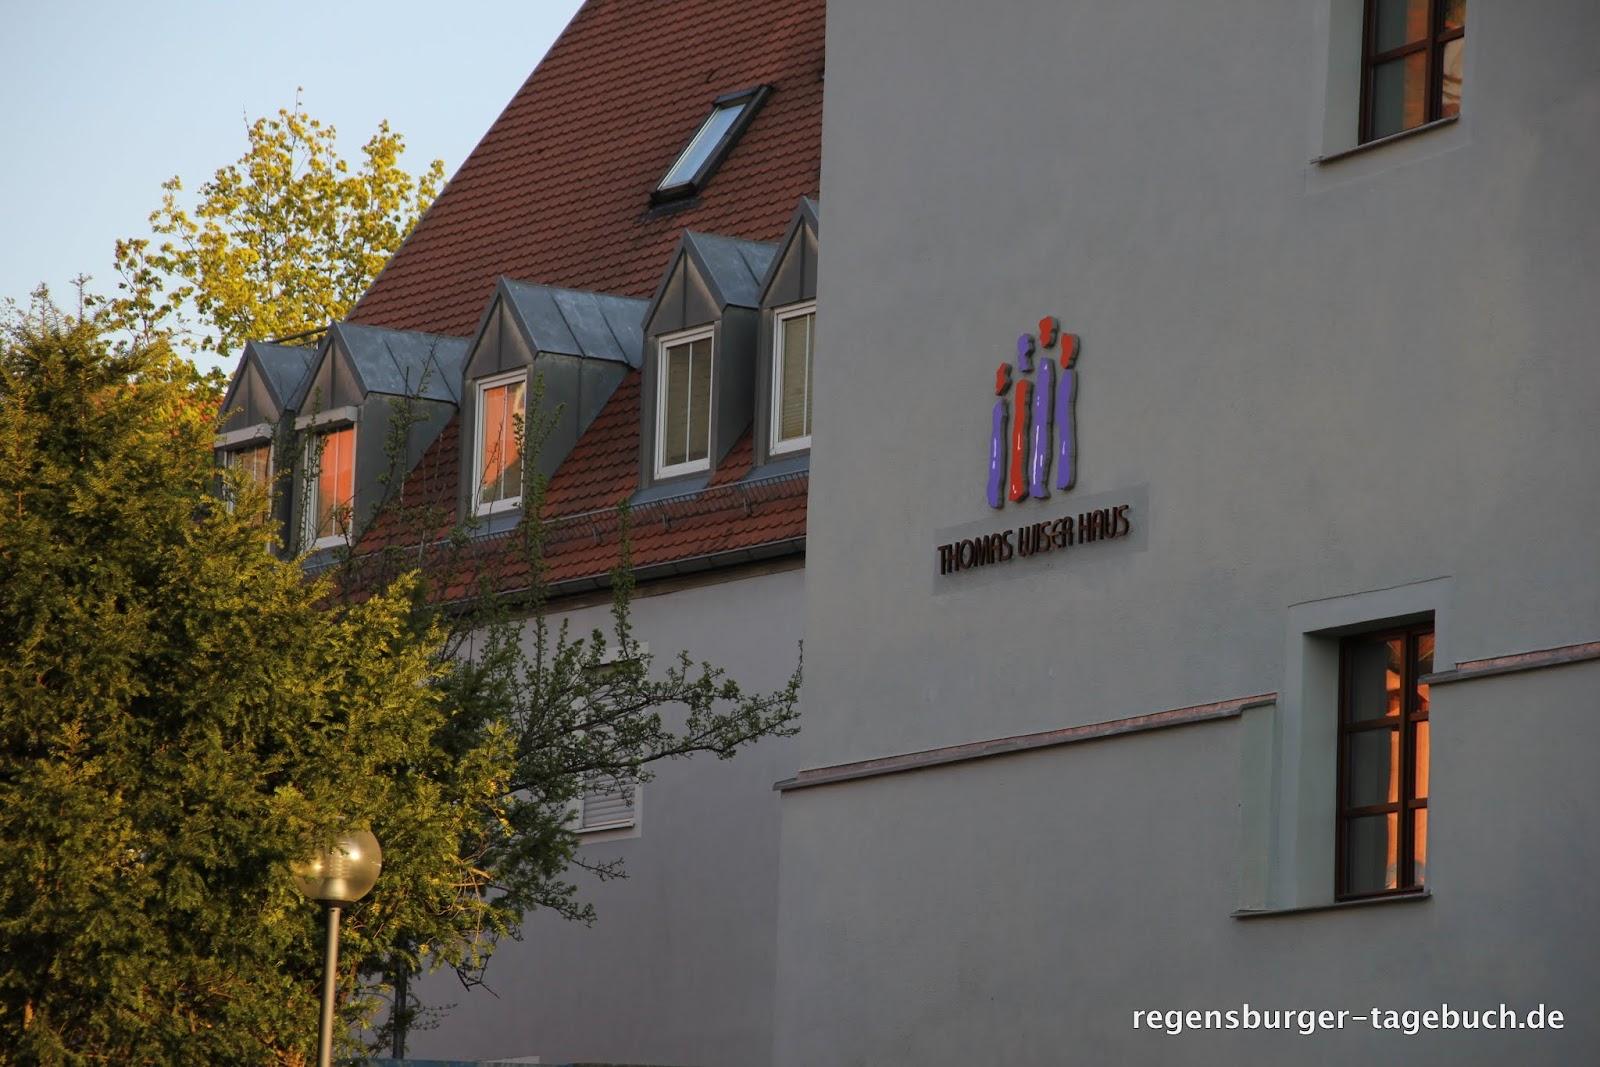 Regensburger Tagebuch: Geheimtipp Veranstaltungsort - Tom\'s Bühne ...